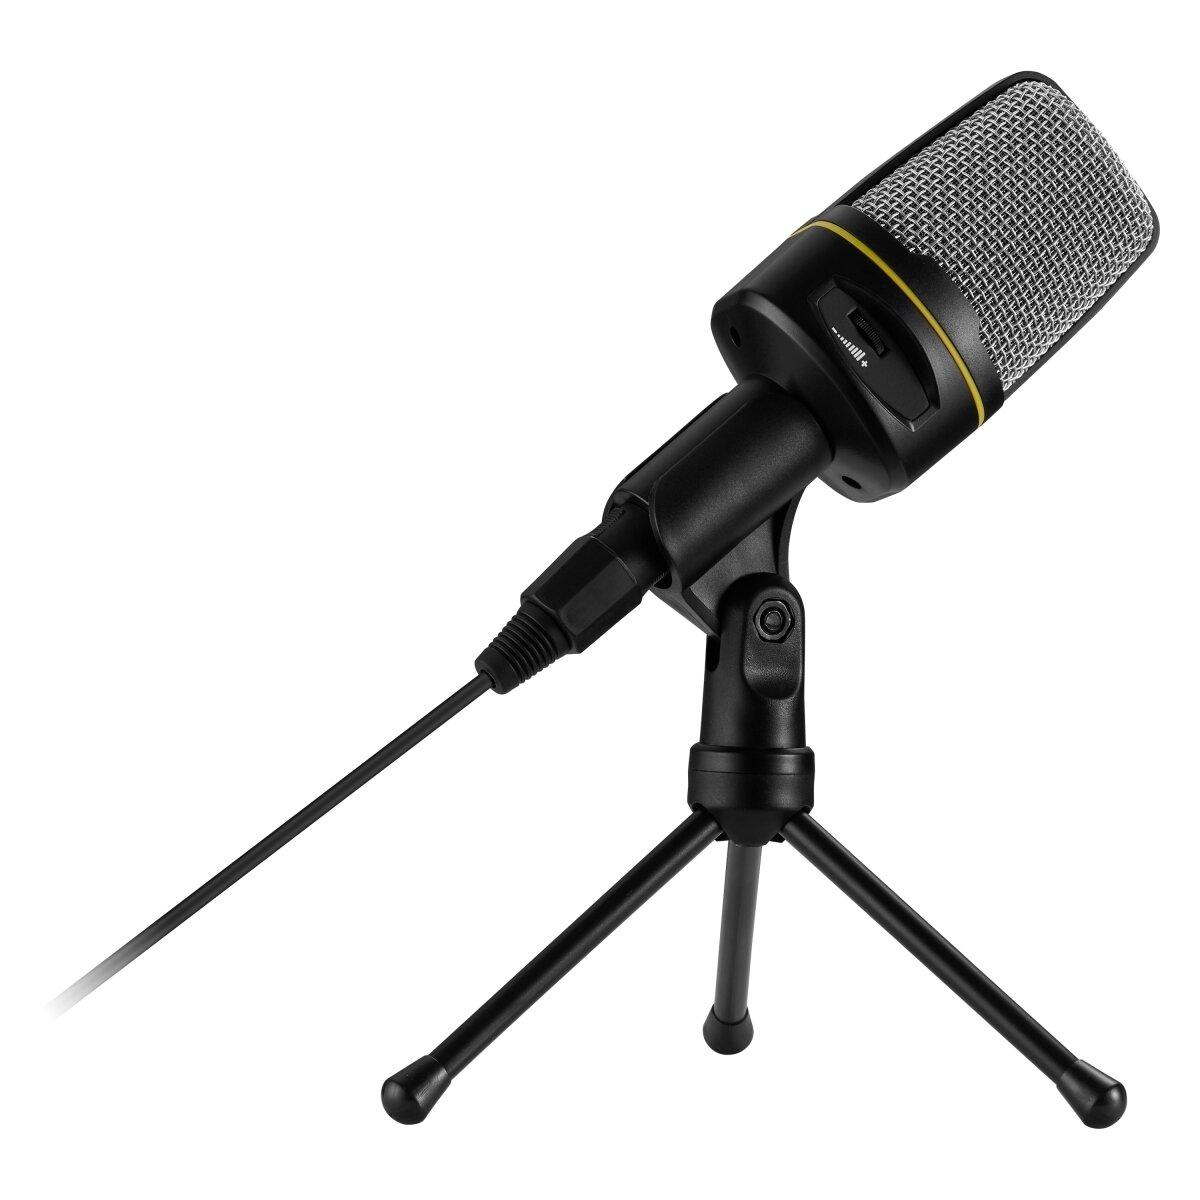 Volkano Stream Media series 3.5mm Microphone